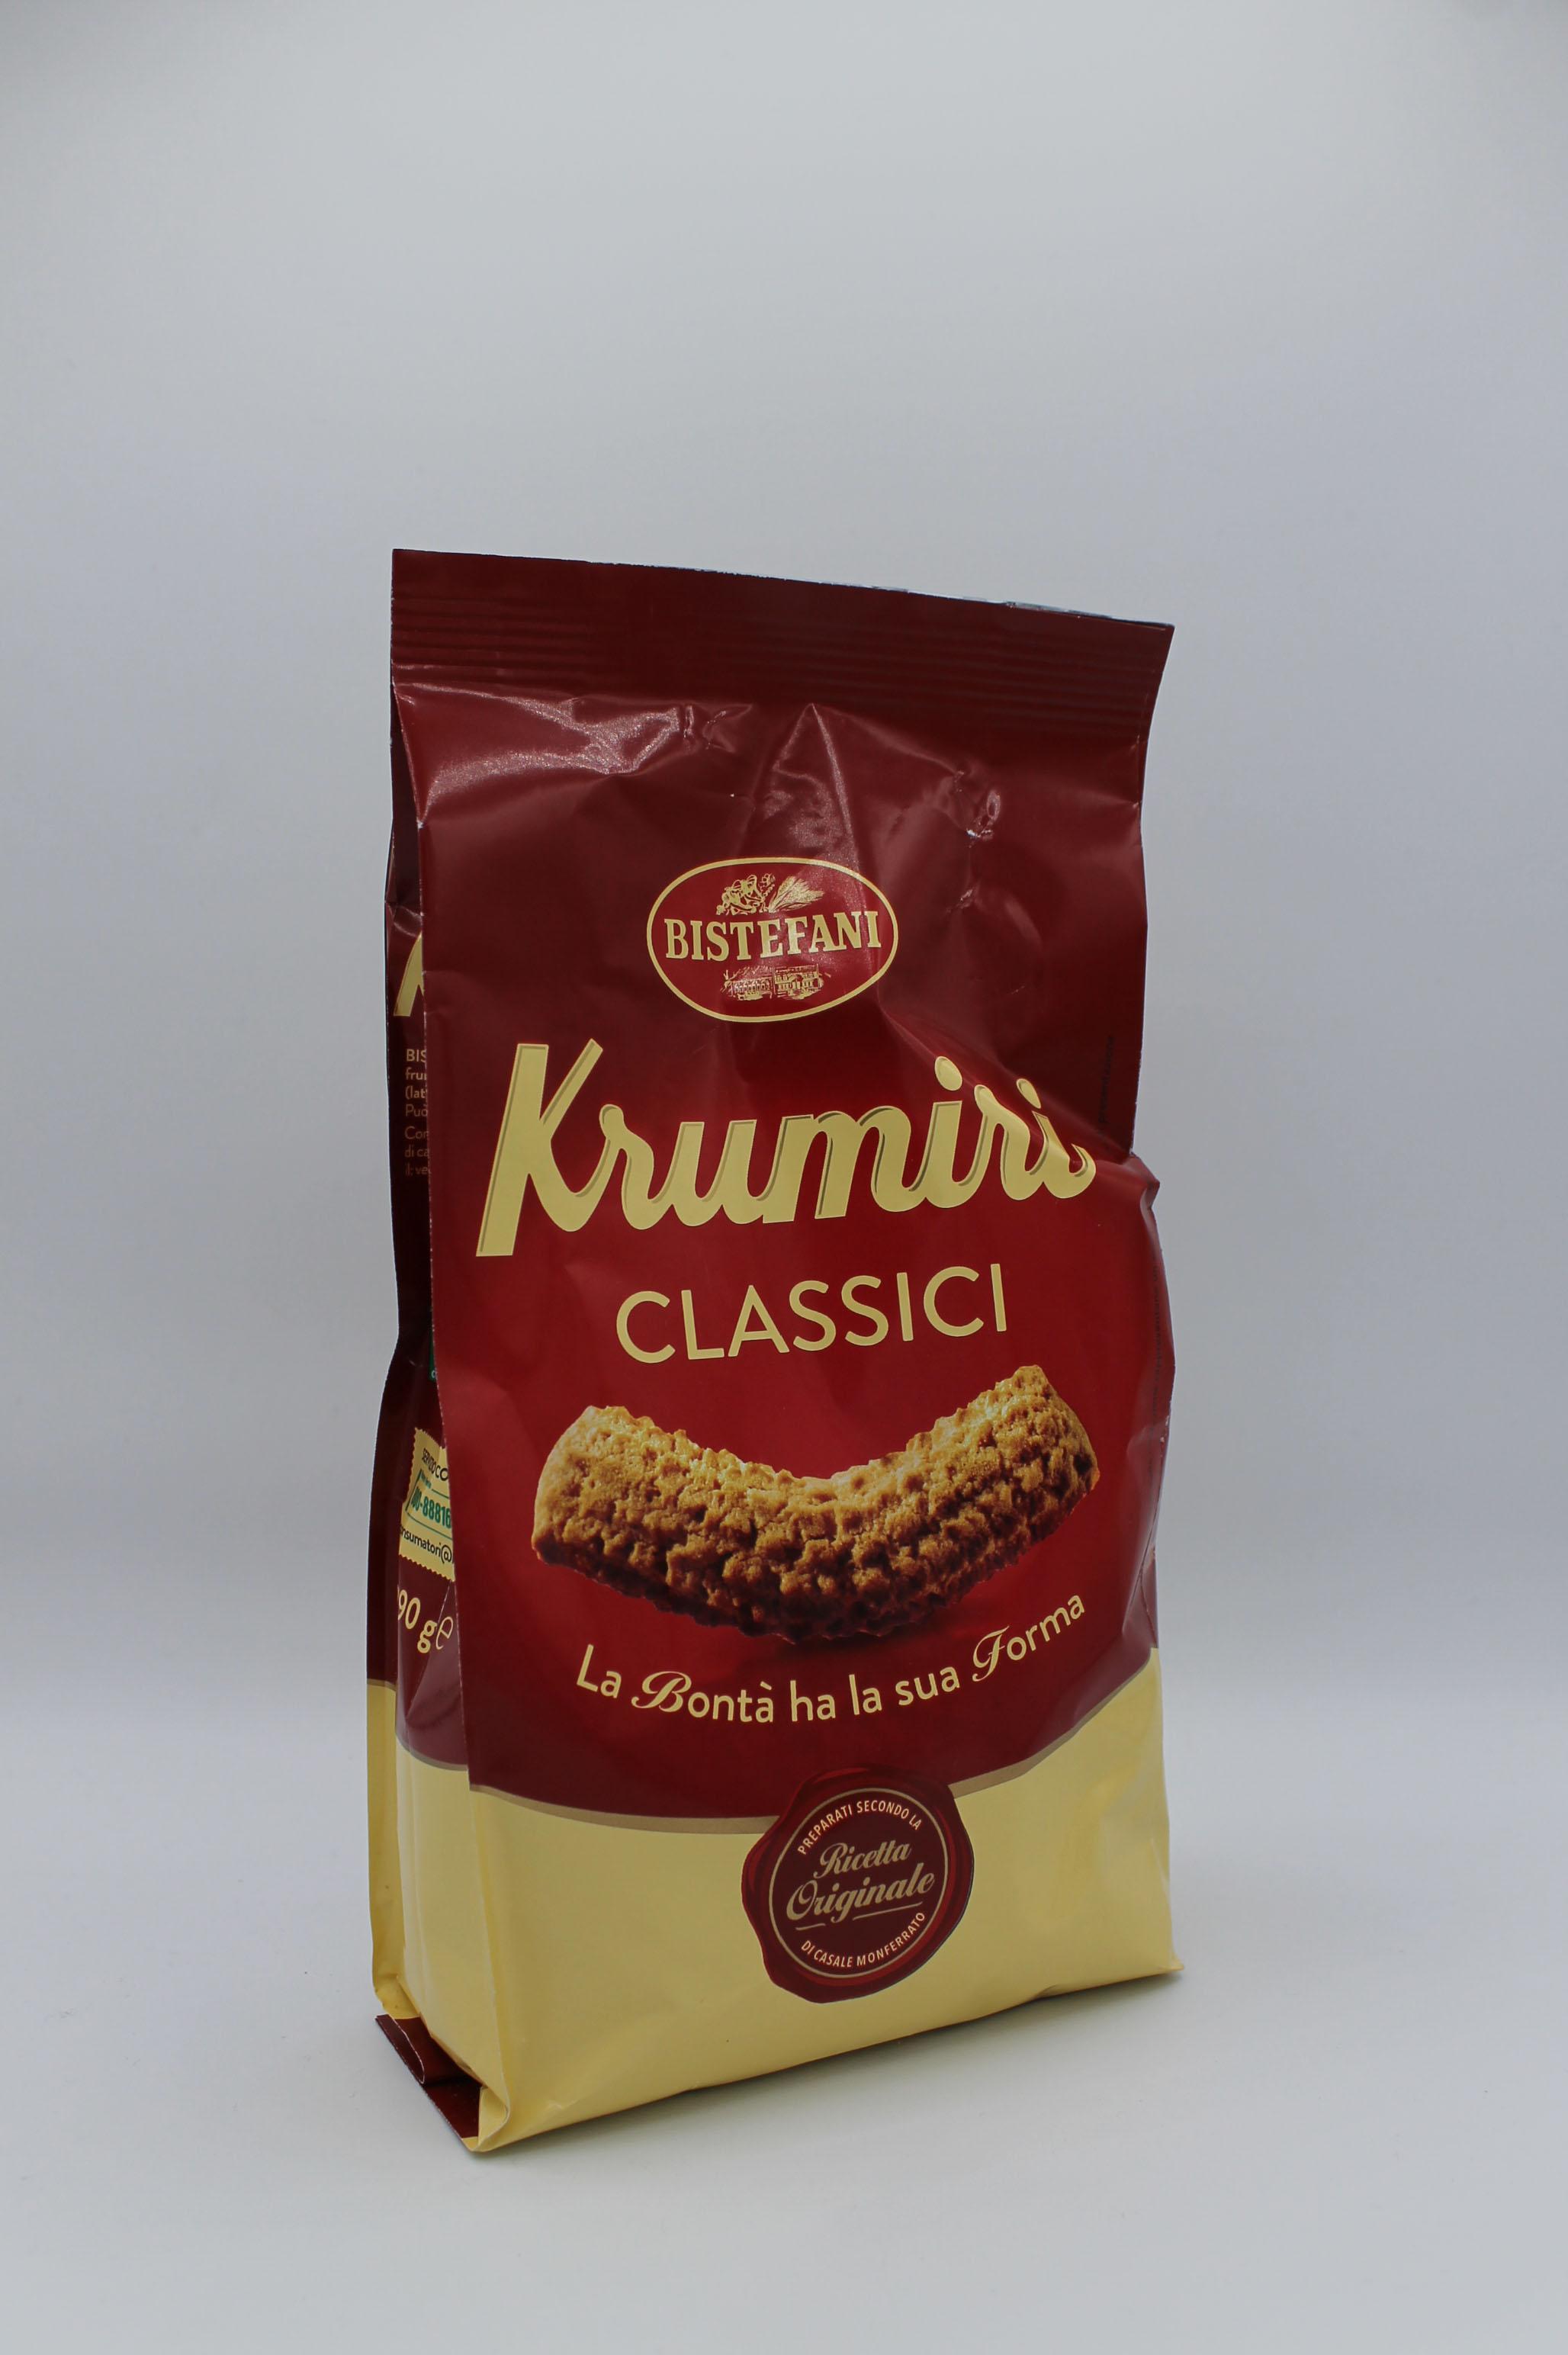 Bistefani biscotti krumiri 290 gr vari gusti.